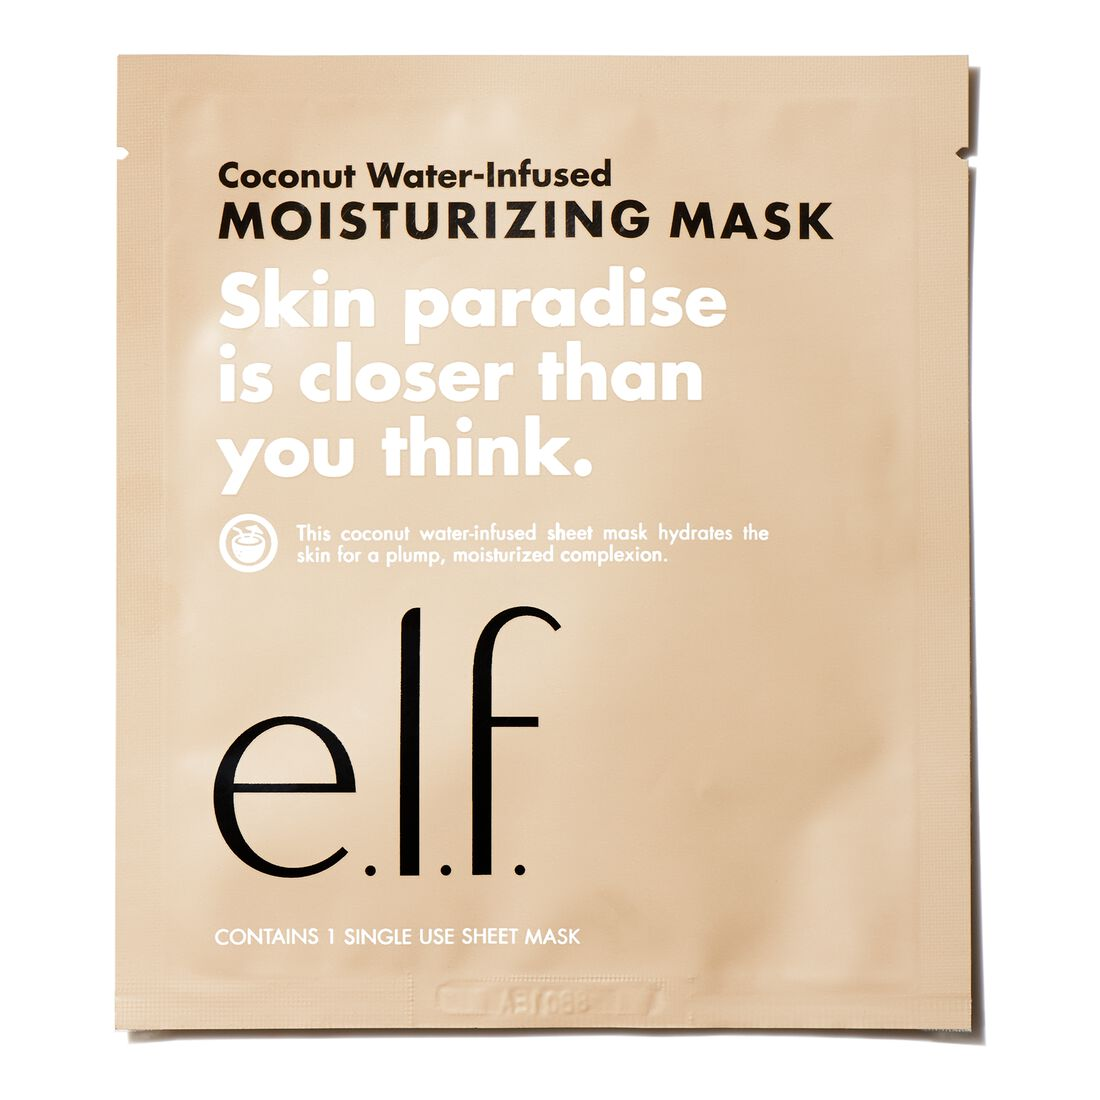 e.l.f. Cosmetics - Coconut Water-Infused Moisturizing Sheet Mask